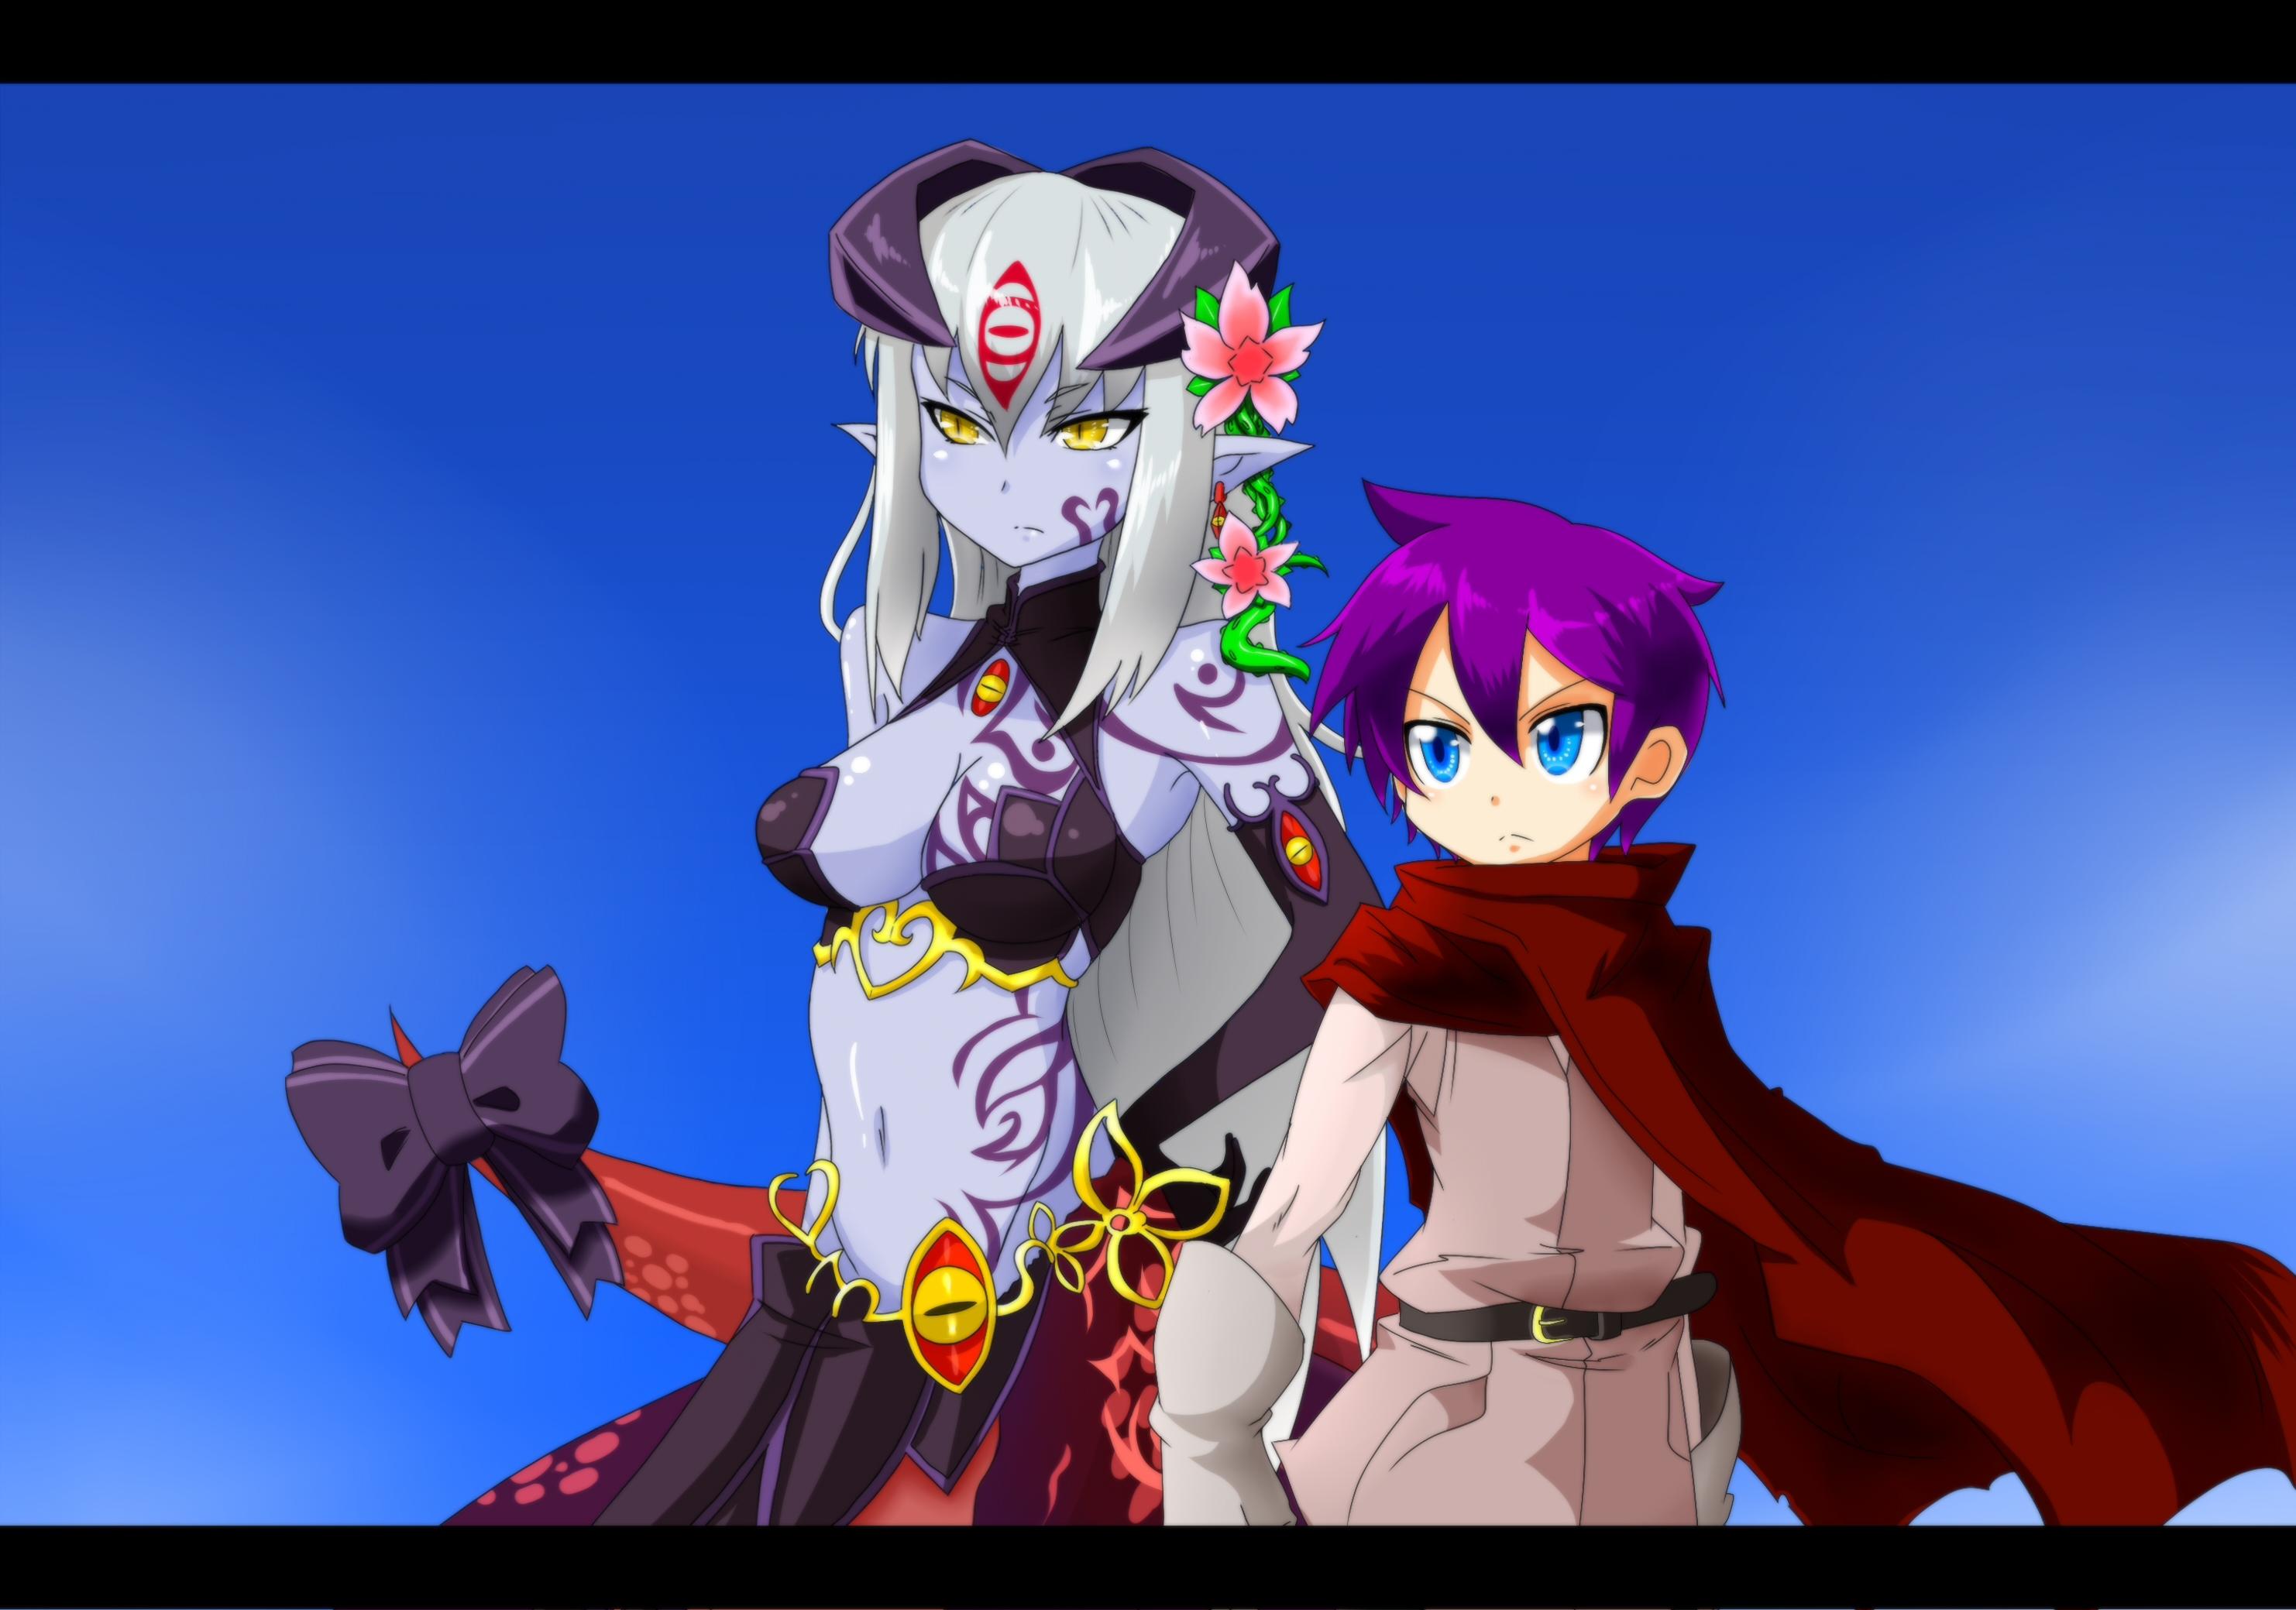 monster girl quest anime/ova, anyone? : monstergirlquest